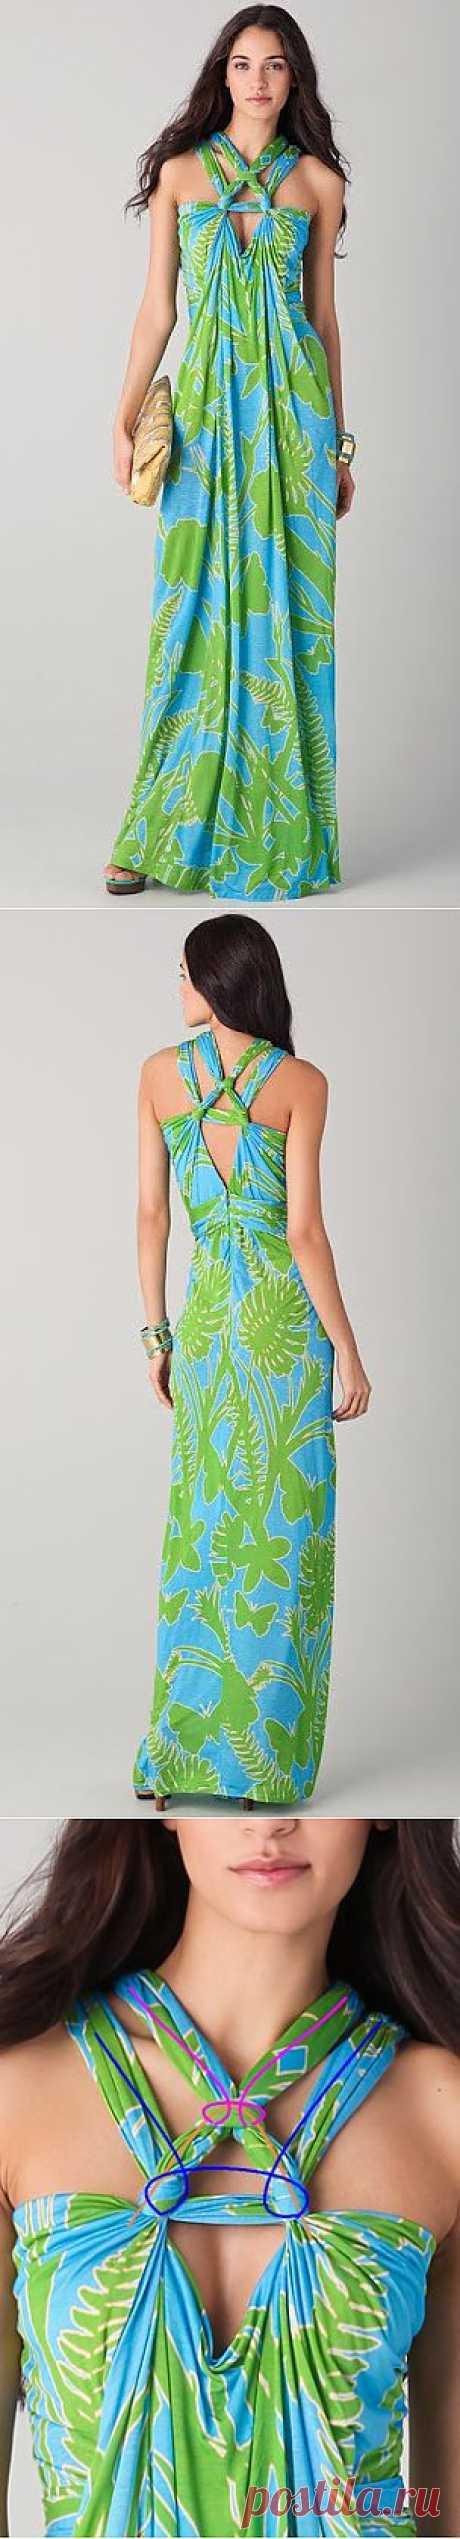 Summer sundress from pattern Matthew Williamson.Prostye.